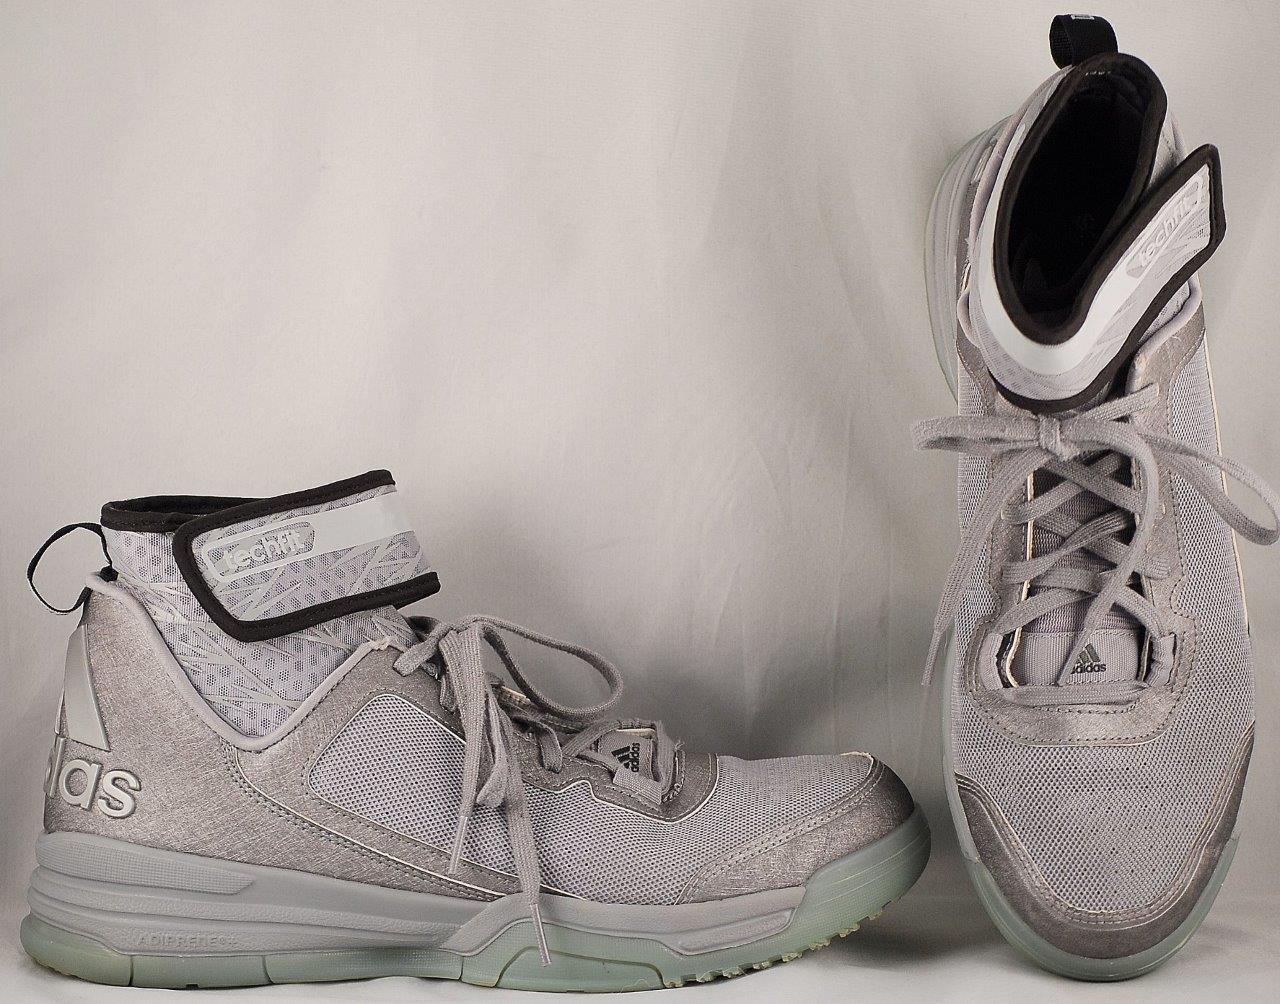 Men's Adidas Techfit Light Silver/Gray Basketball Shoes US 9.5 UK ...